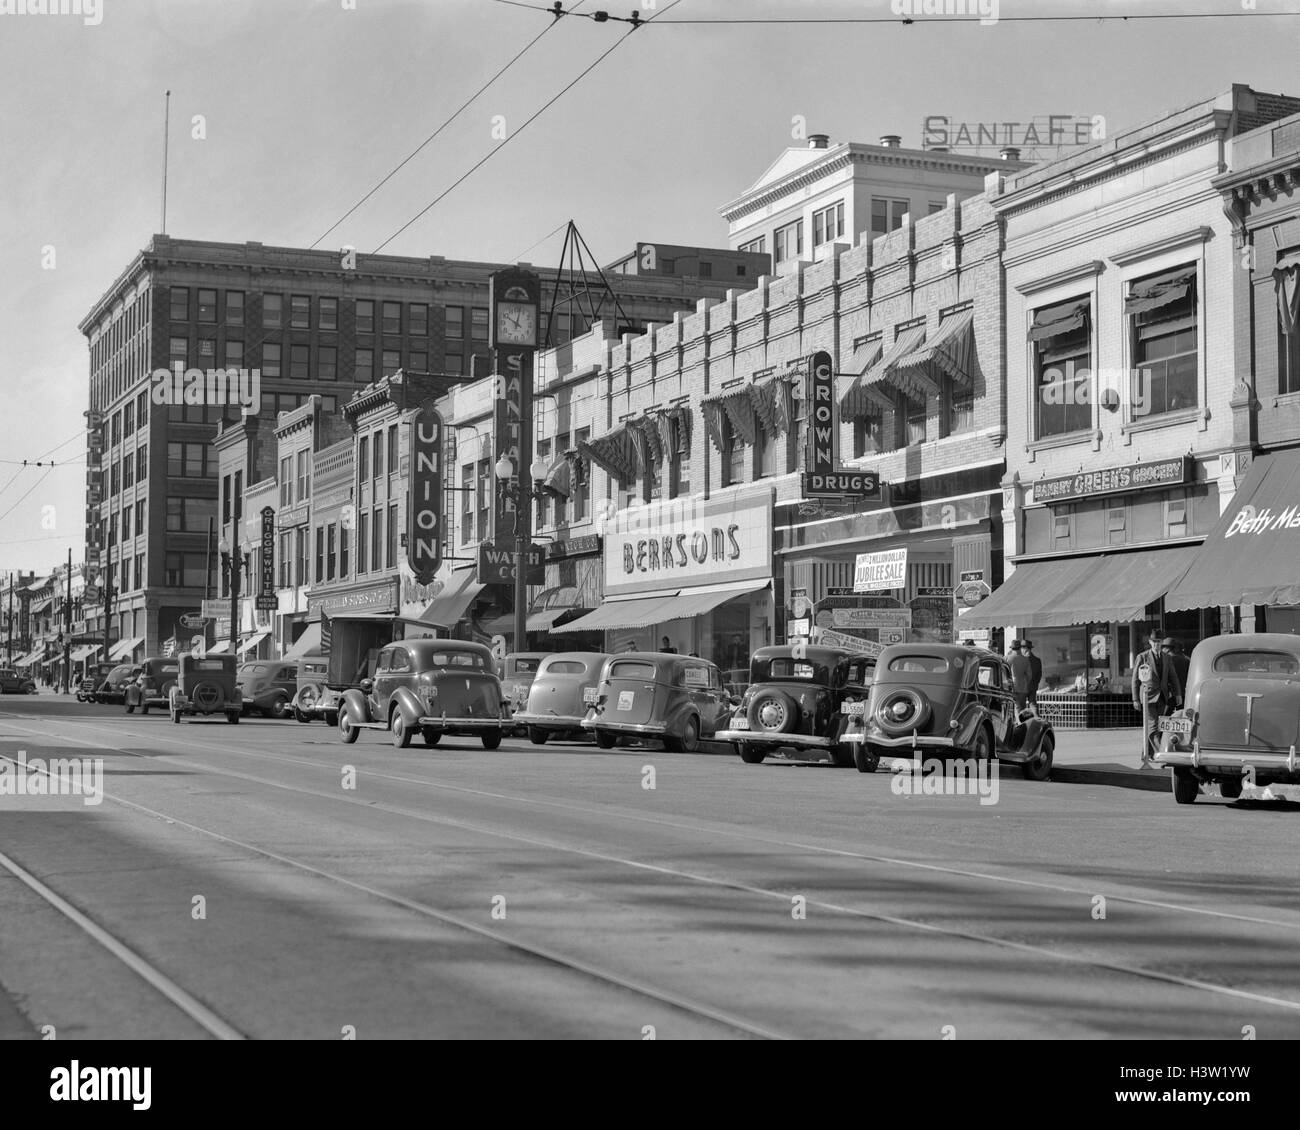 1940s KANSAS STREET SHOPPING DISTRICT CARS SHOPS STOREFRONTS TOPEKA KANSAS USA - Stock Image